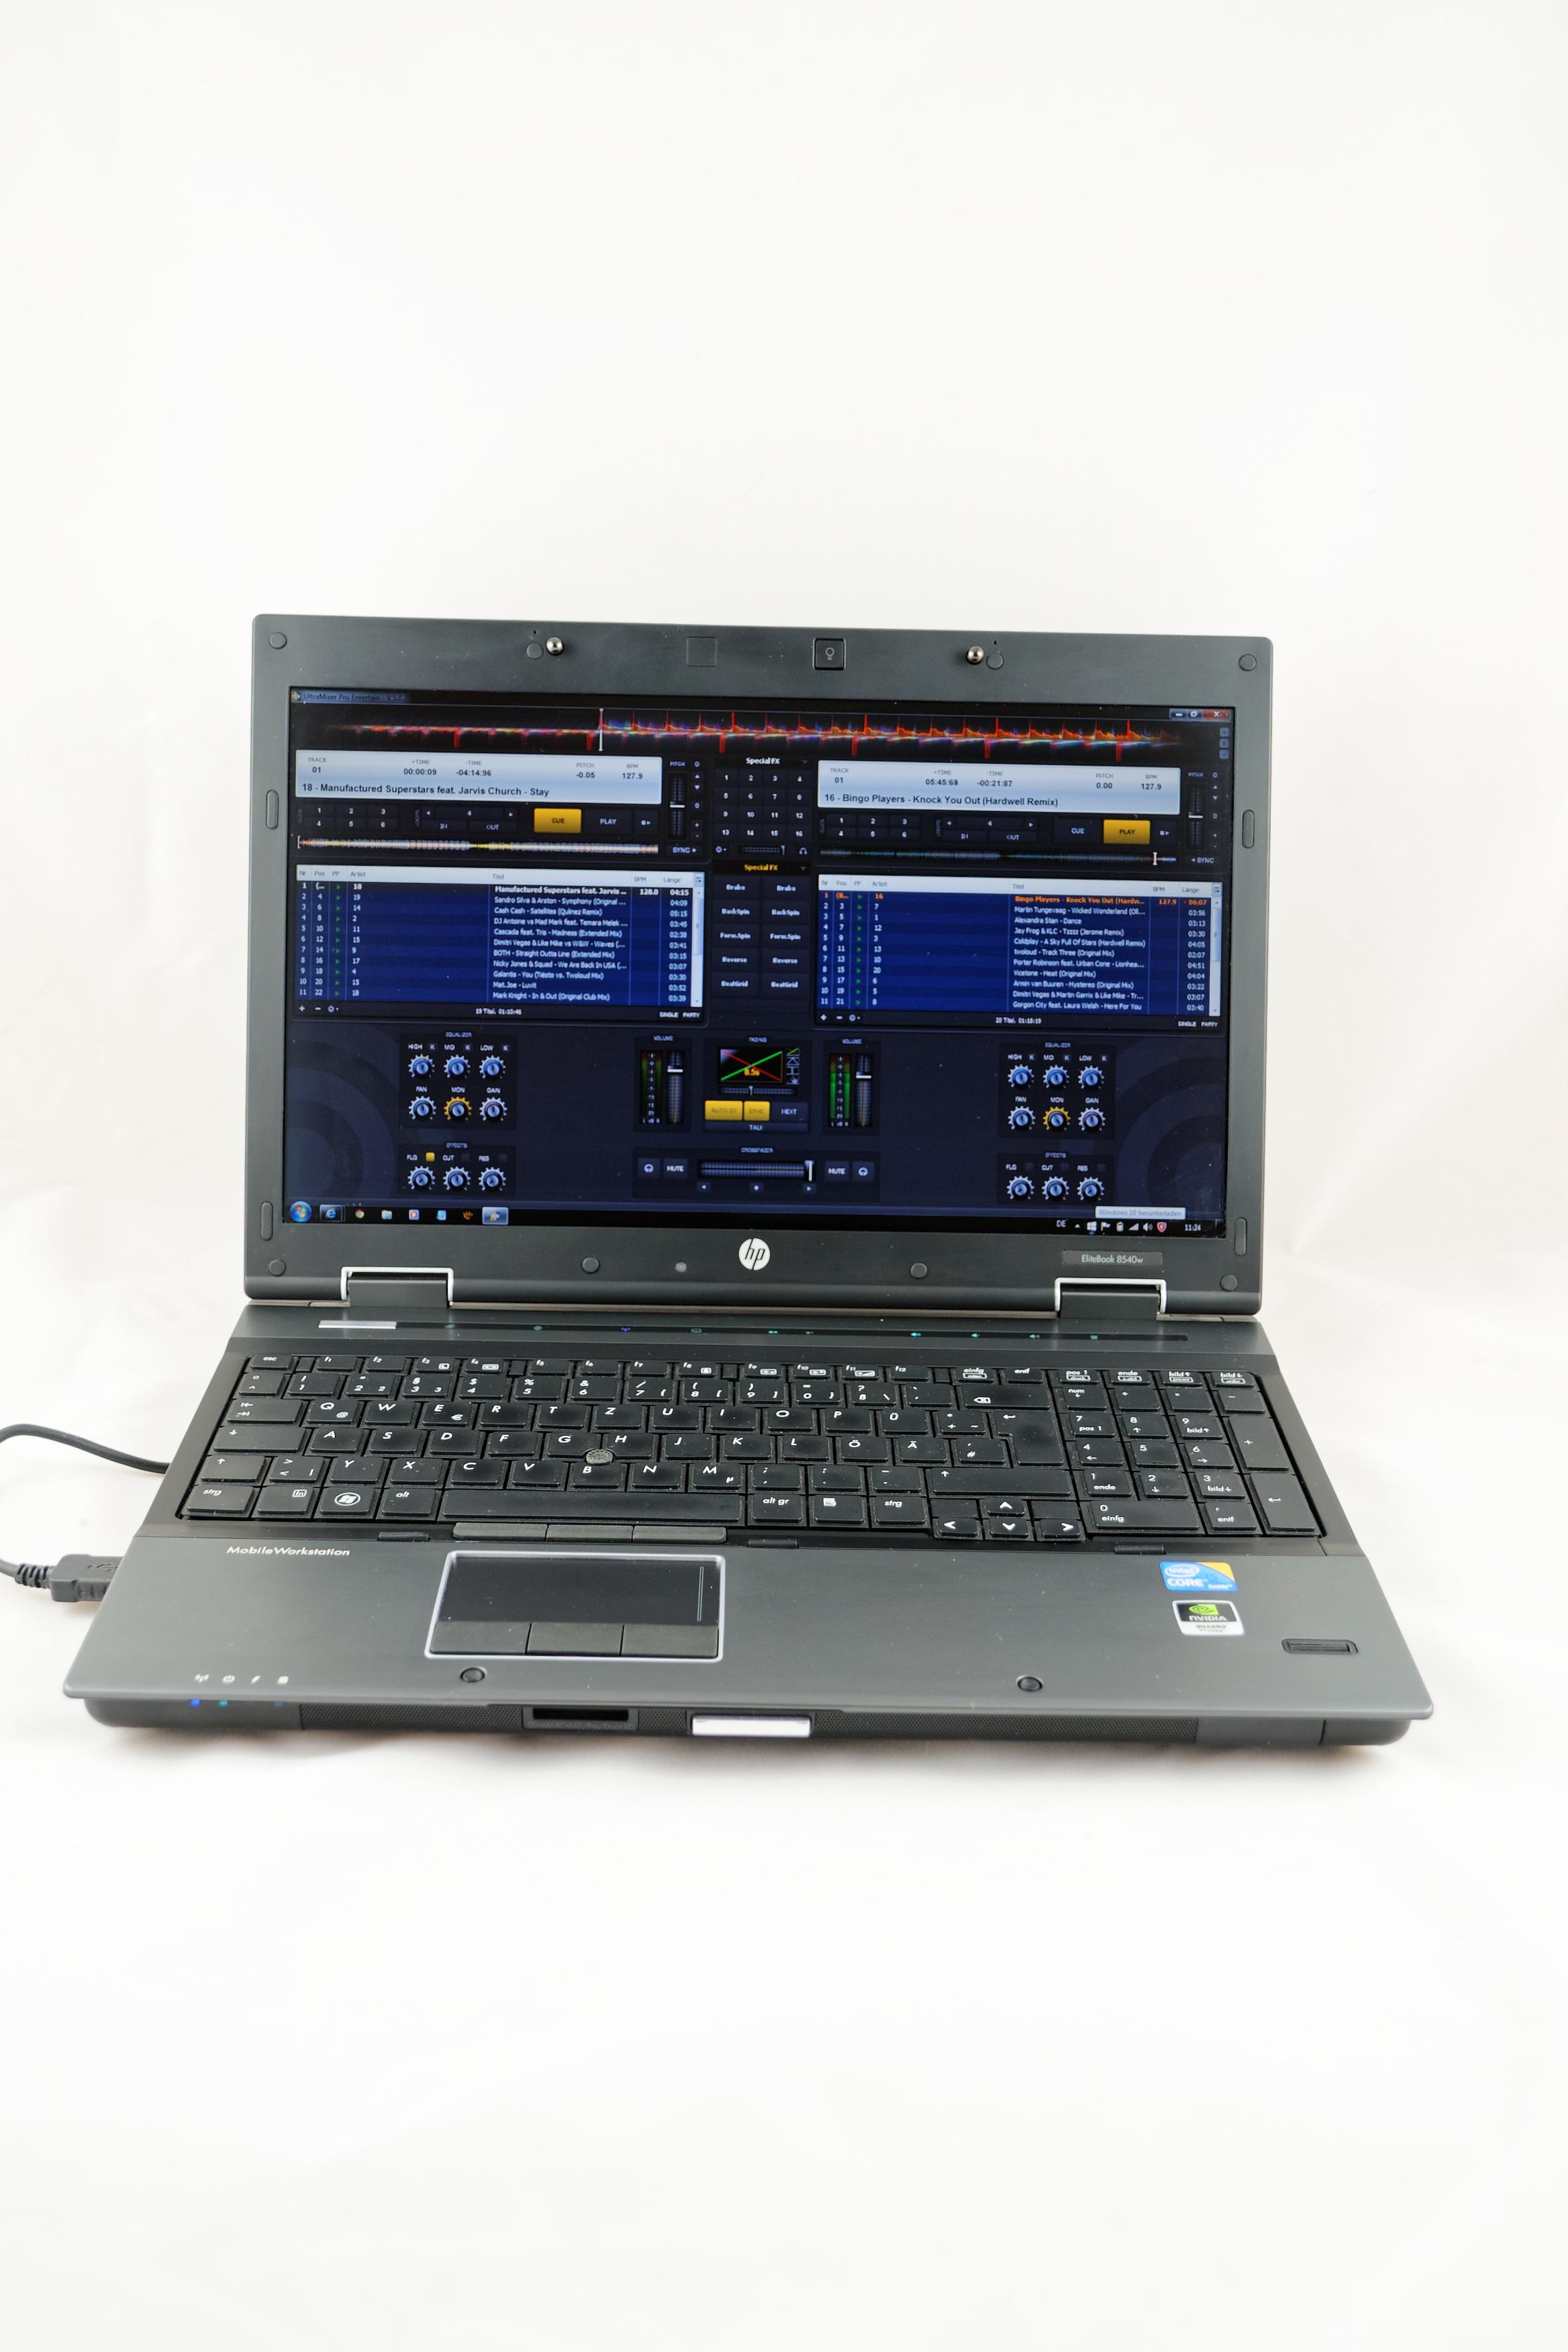 Dm2 mixman mixer additional software to convert to a midi.